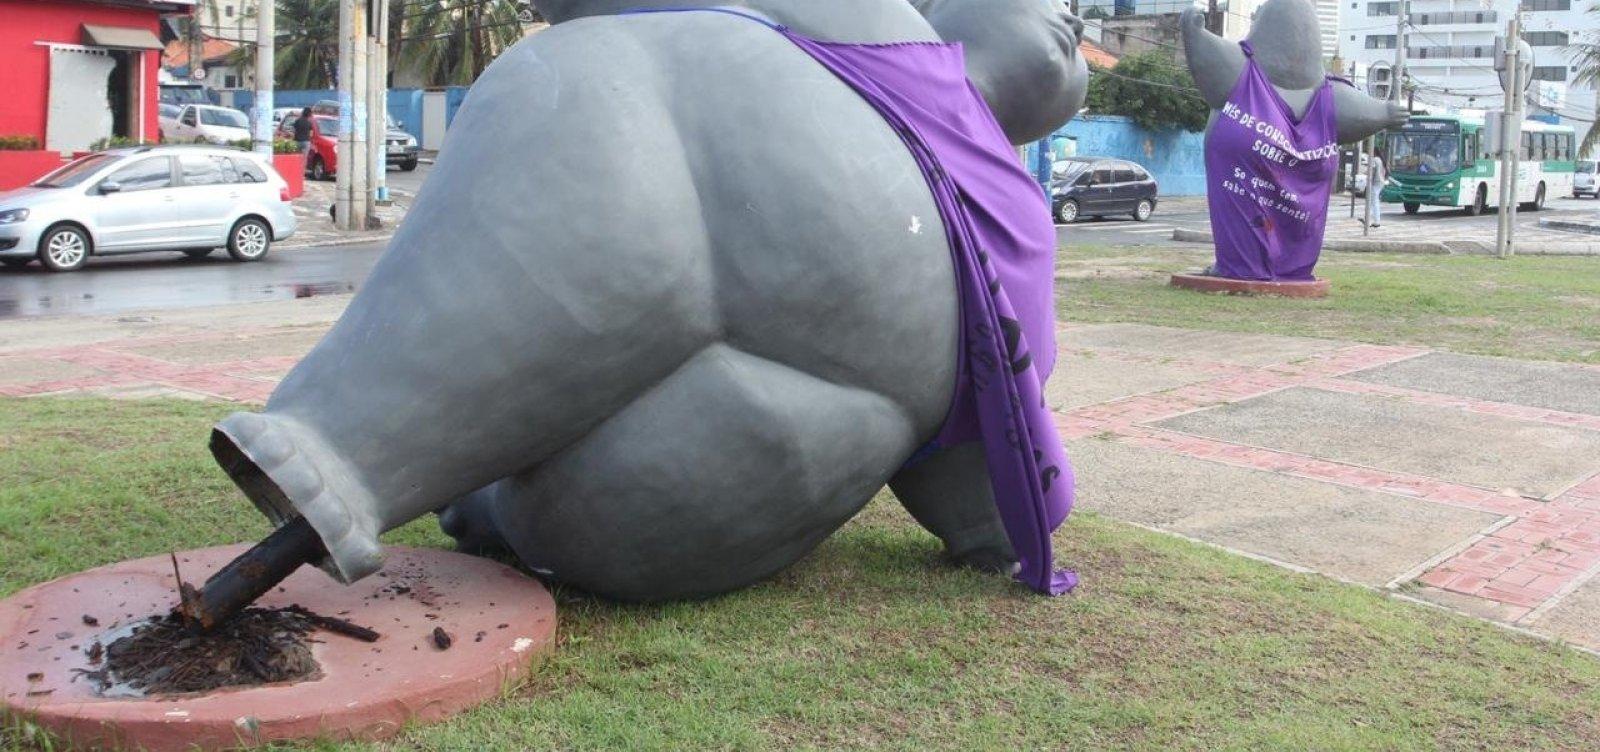 Após obra da prefeitura, 'gorda' de Eliana Kertész tomba